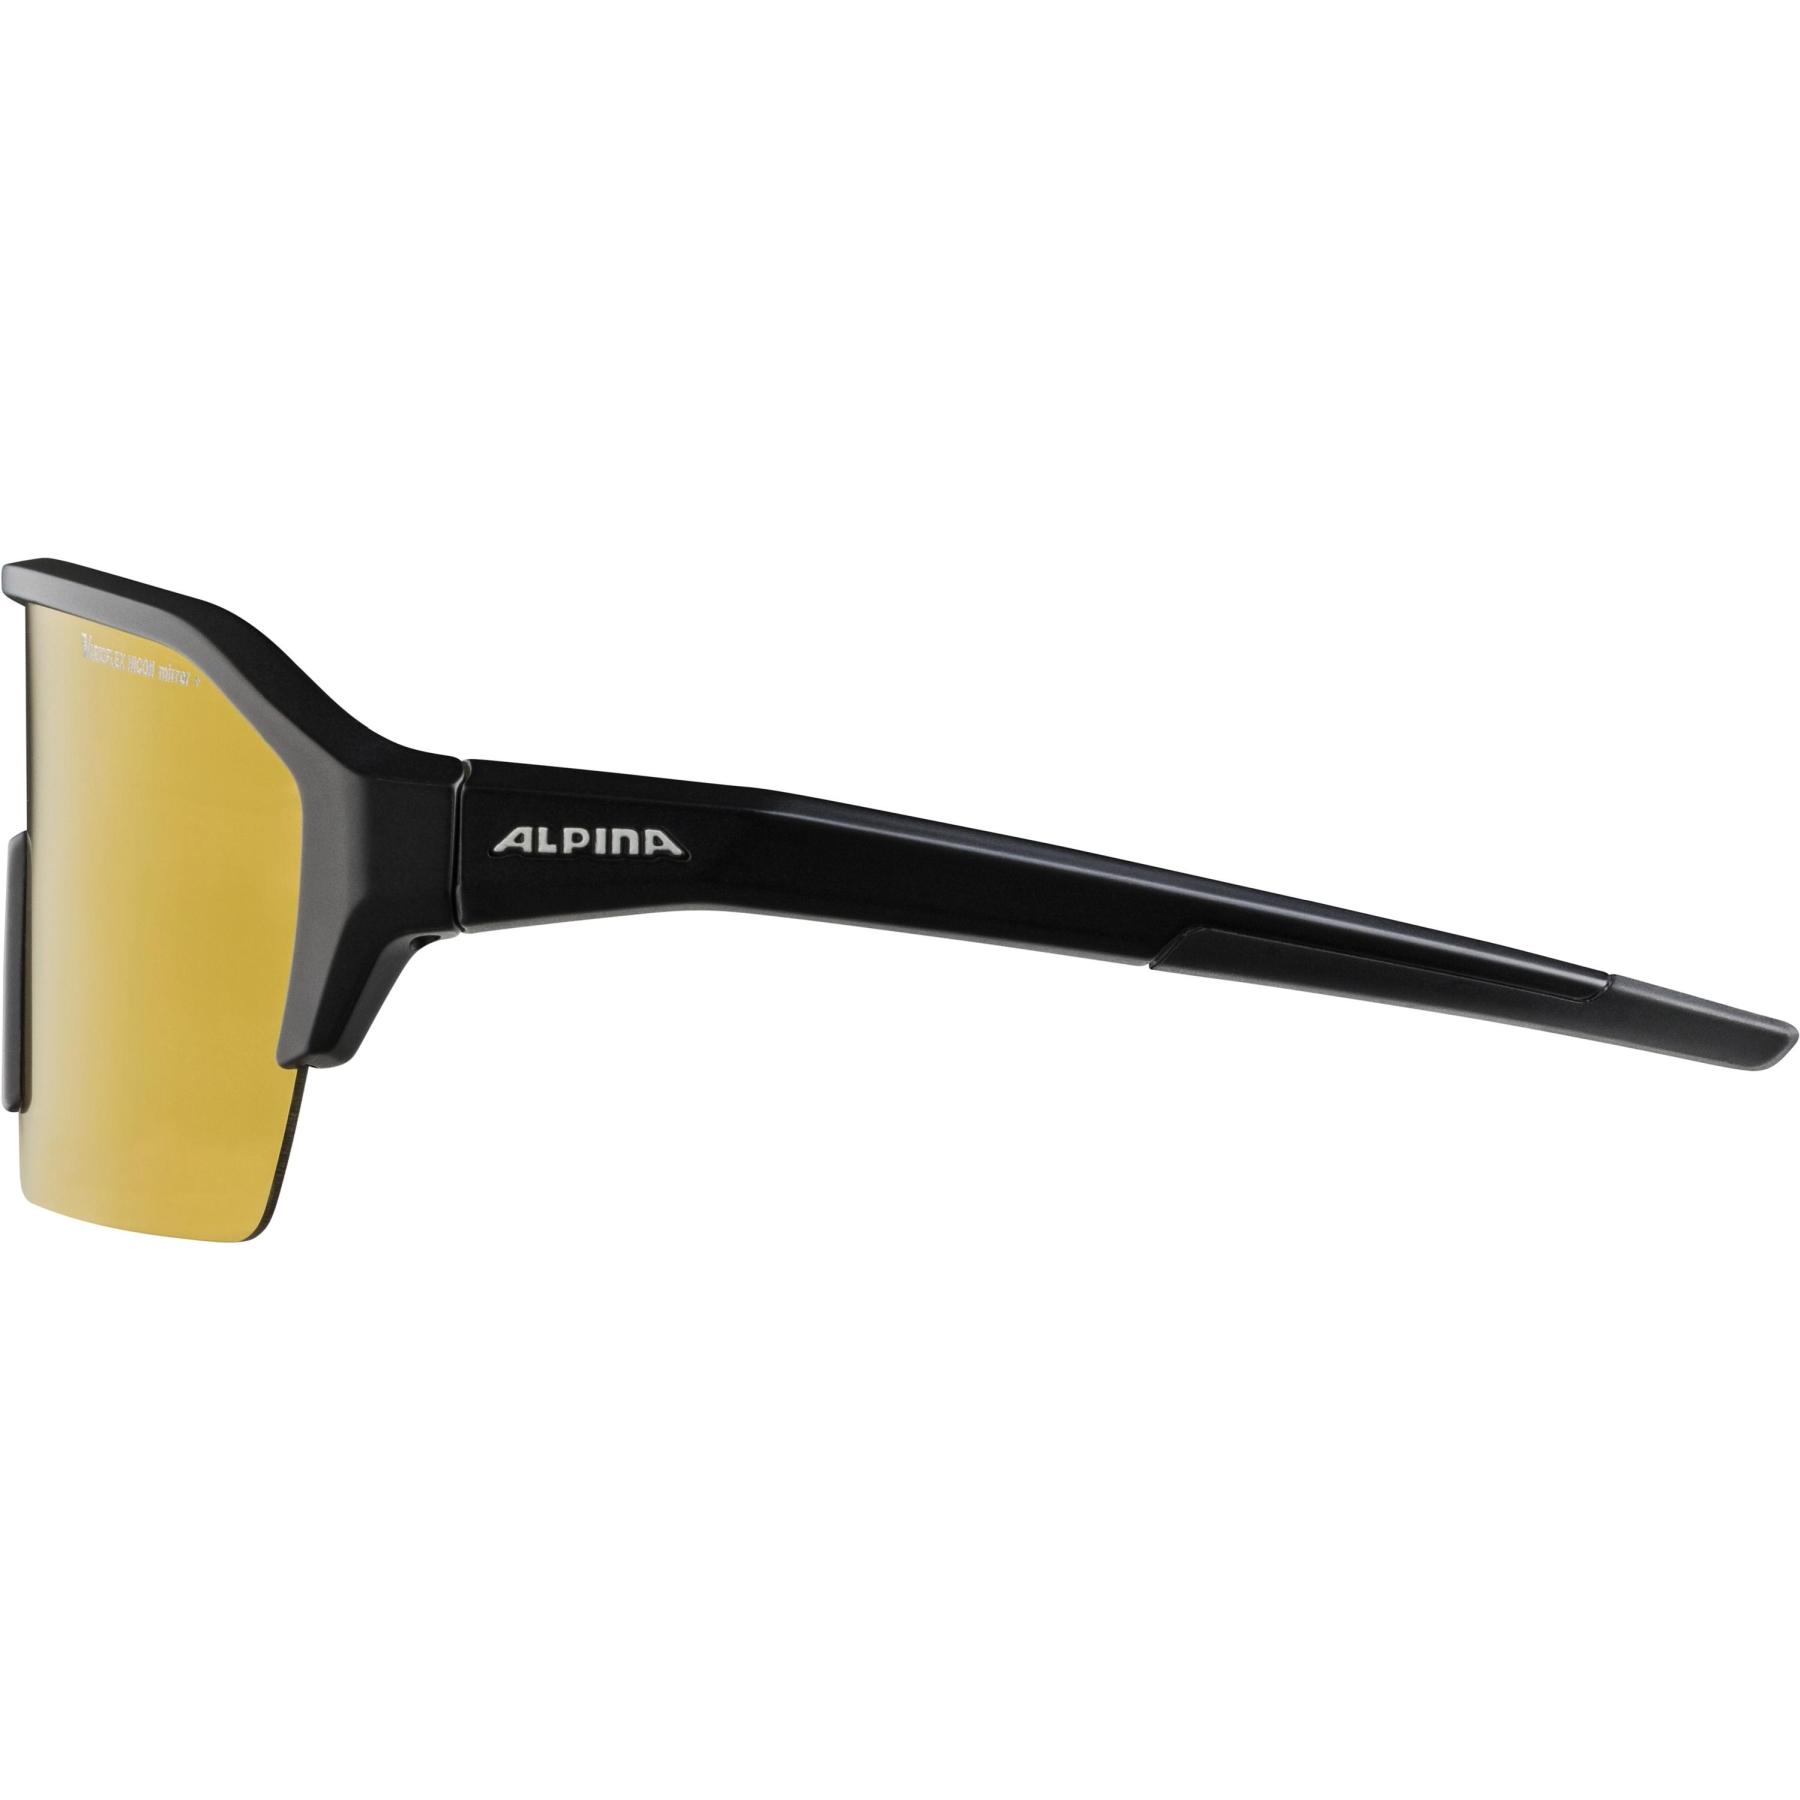 Image of Alpina Ram HR HVLM+ Glasses - black matt / Hicon Varioflex silver mirror